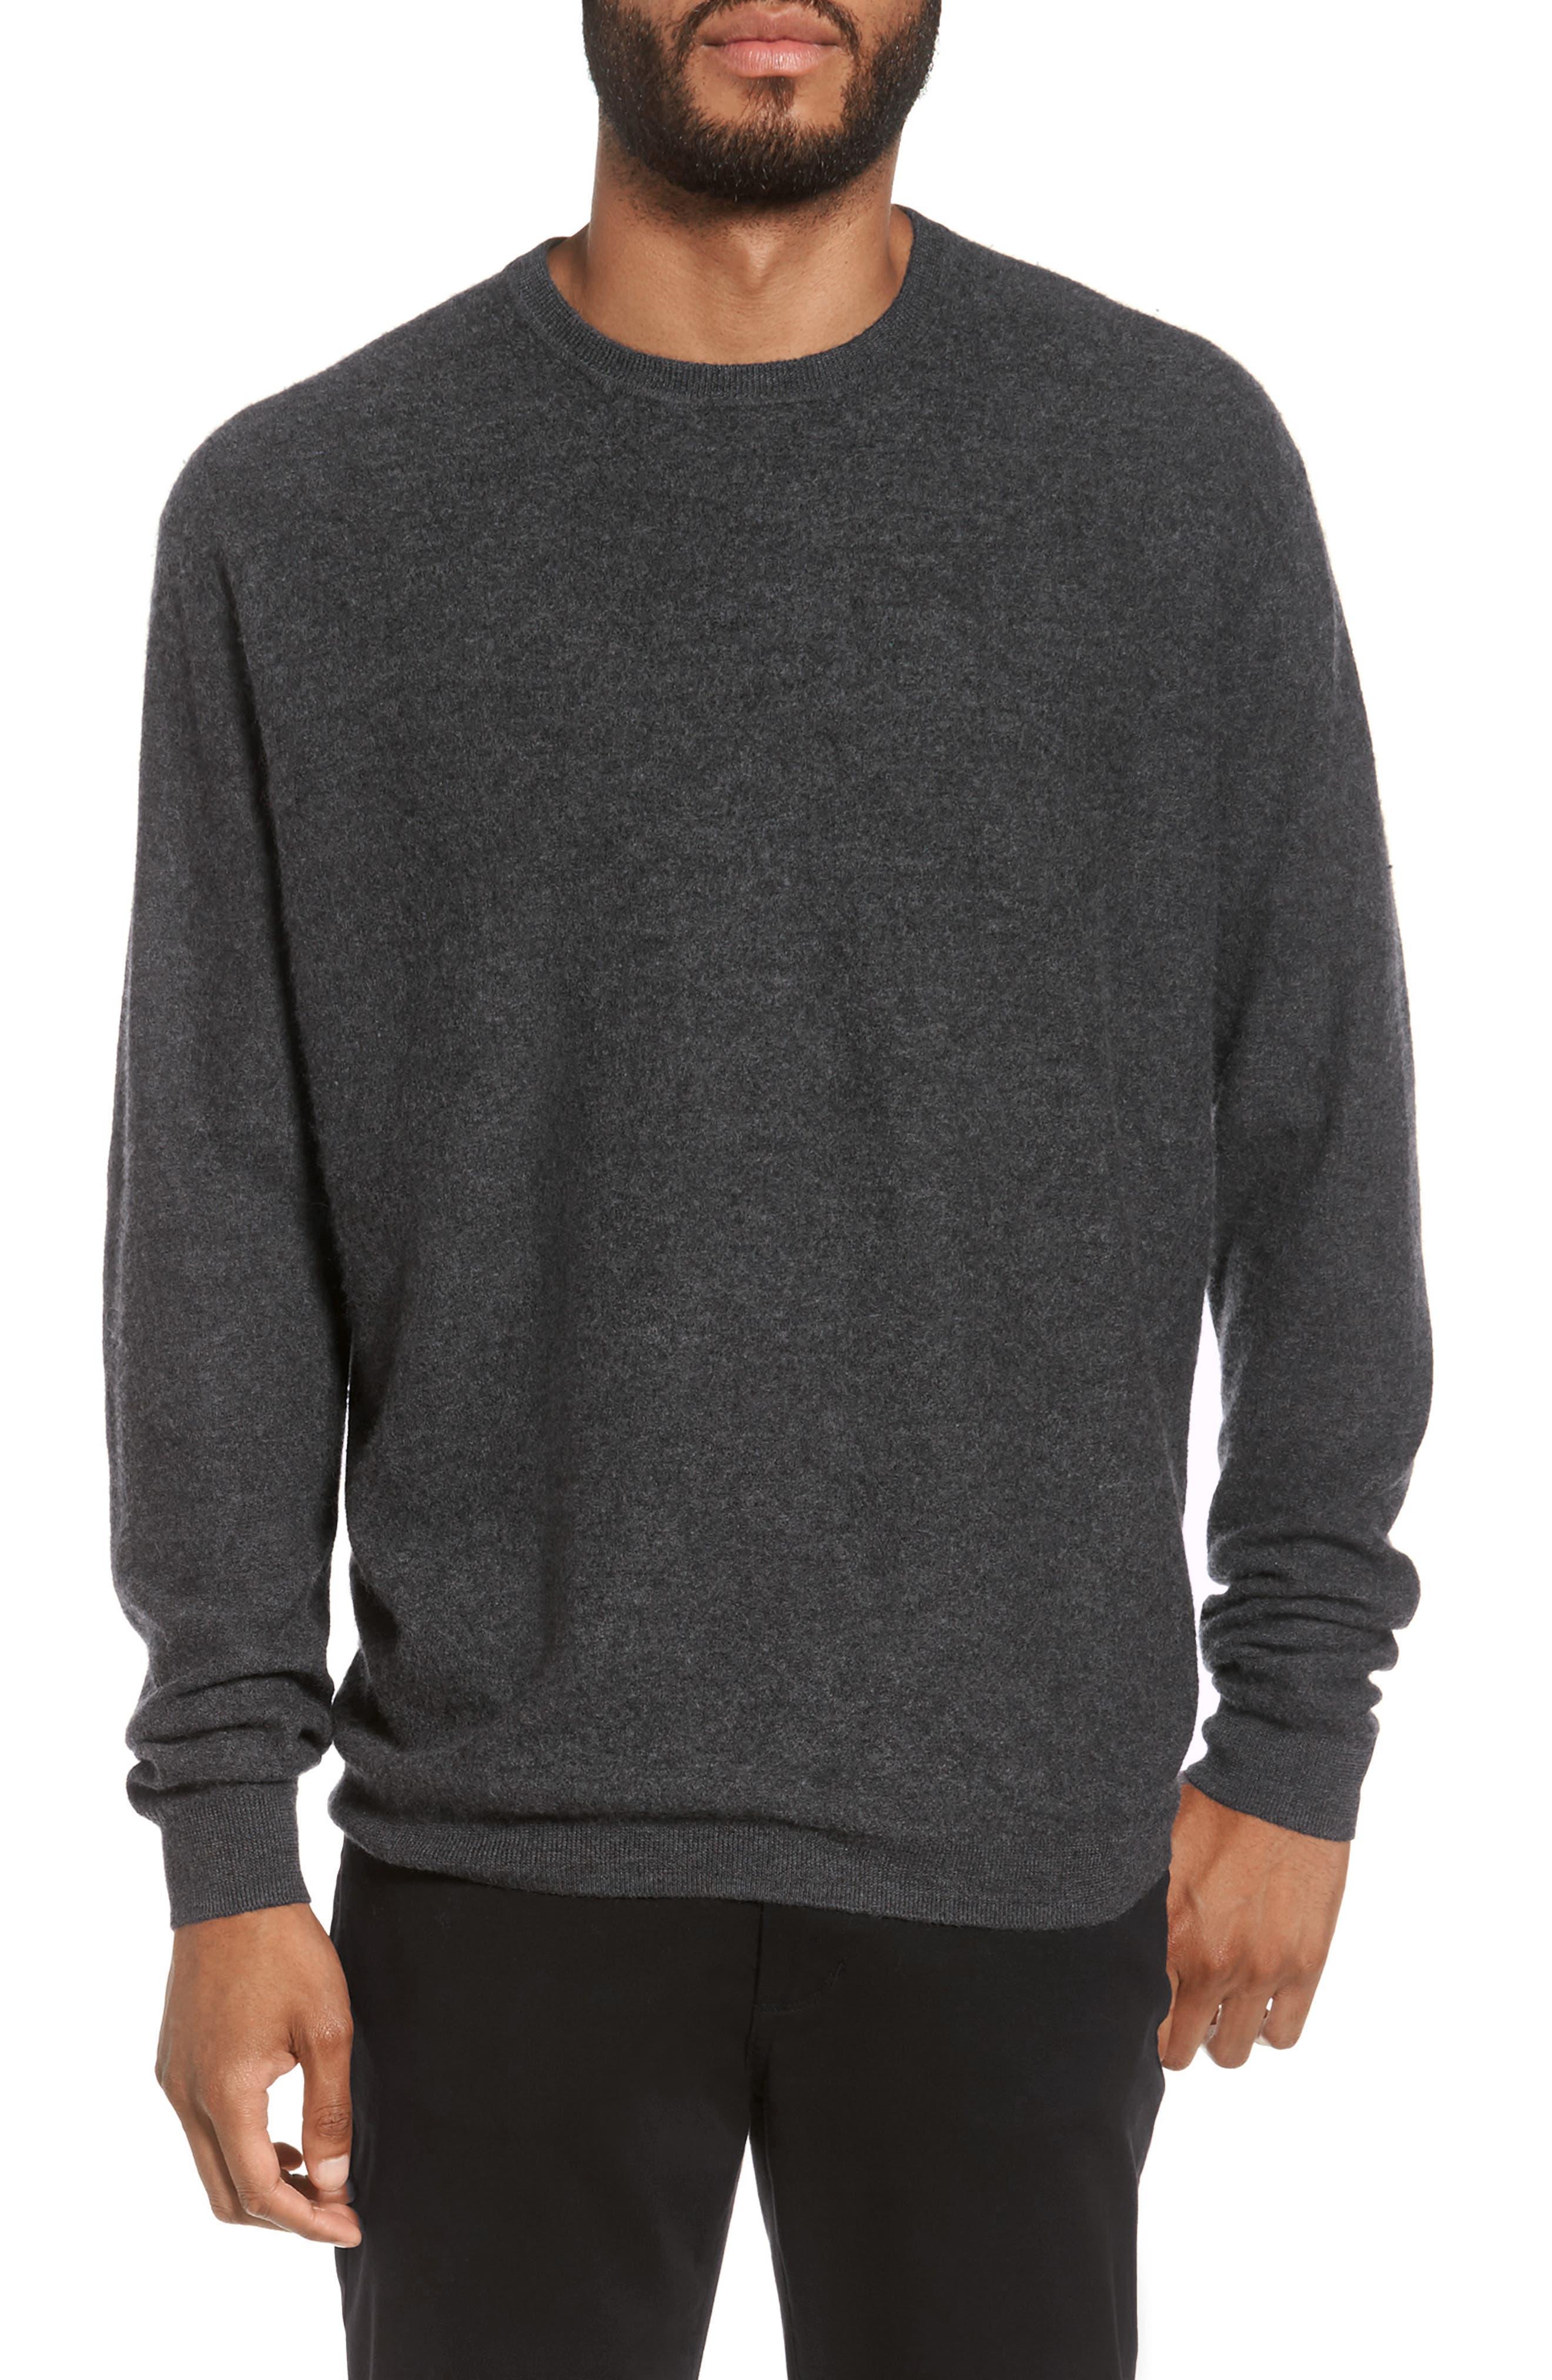 Alternate Image 1 Selected - Vince Cashmere Crewneck Sweater